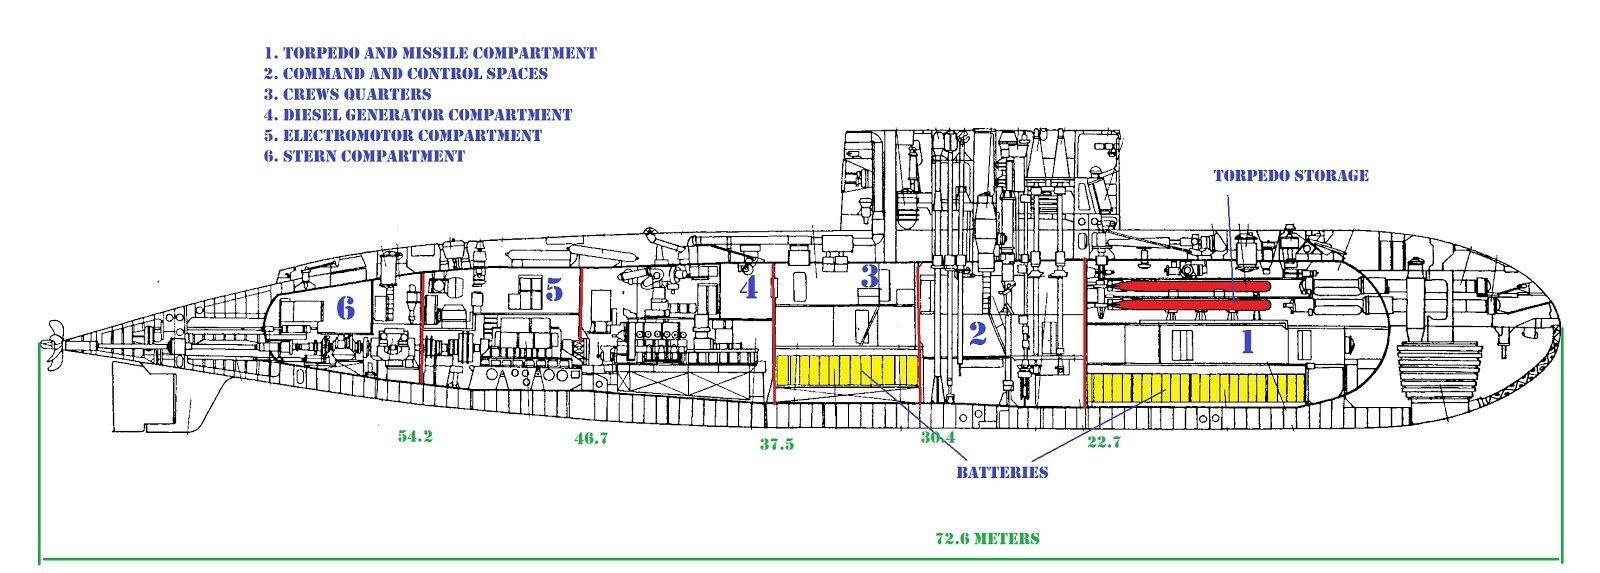 medium resolution of image result for kilo class submarine plans